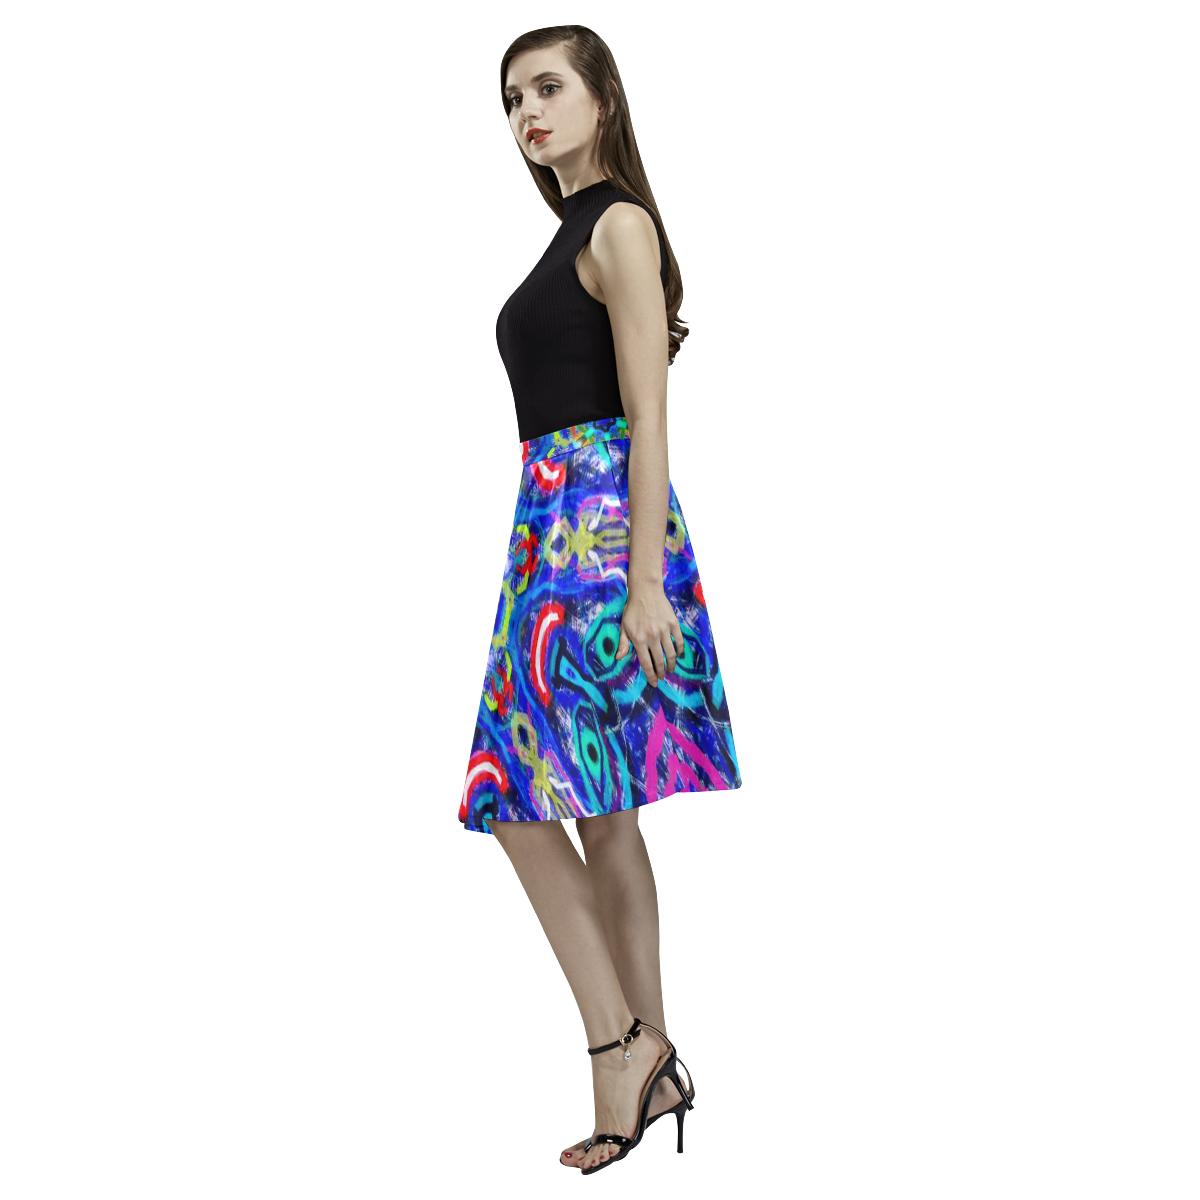 Thleudron Women's The Rancher Melete Pleated Midi Skirt (Model D15)